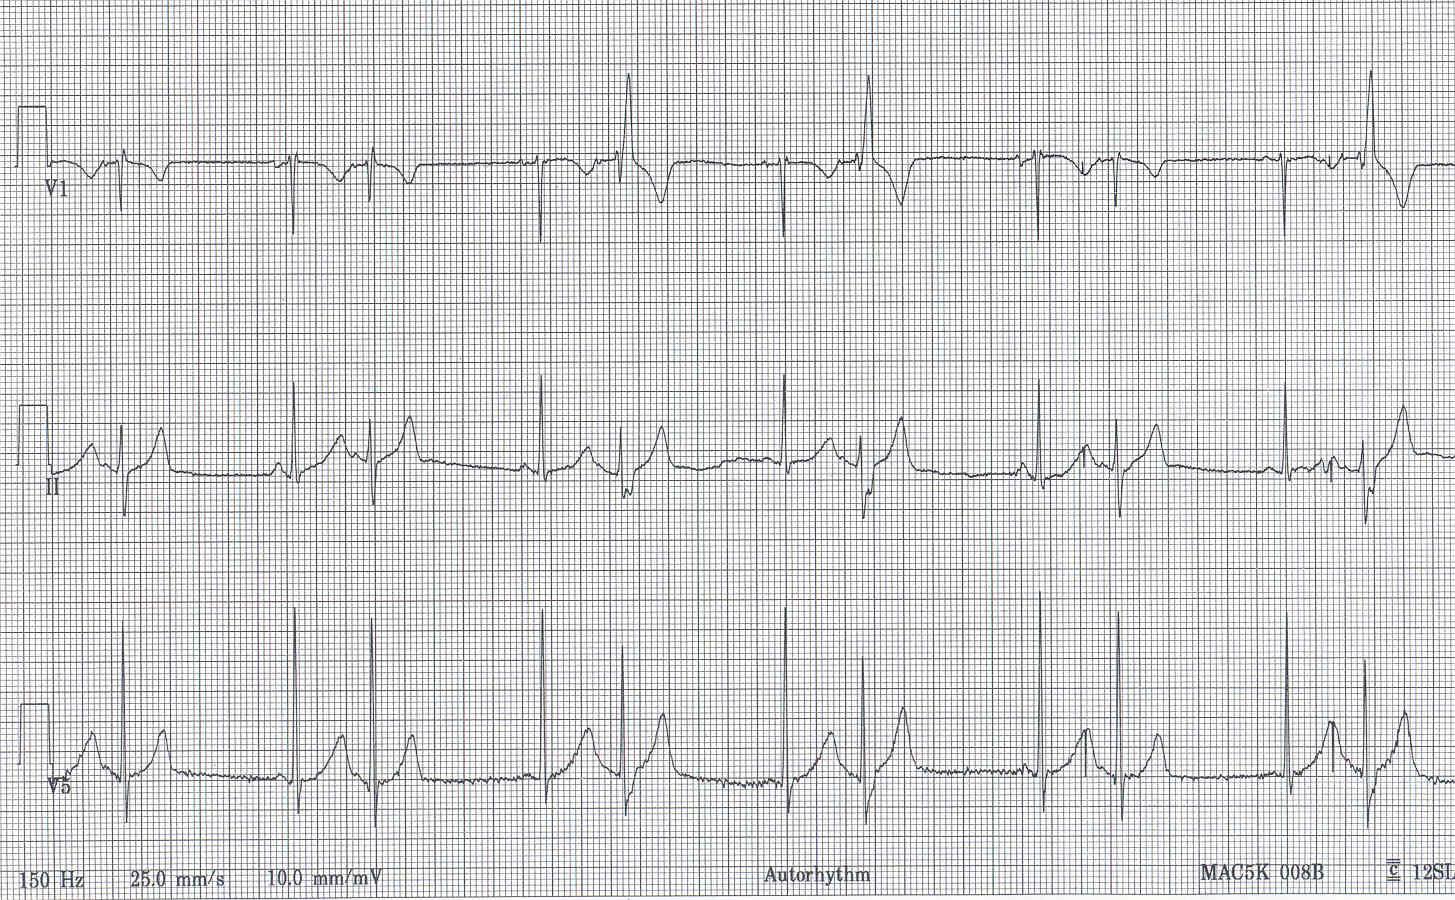 Pedi Cardiology February